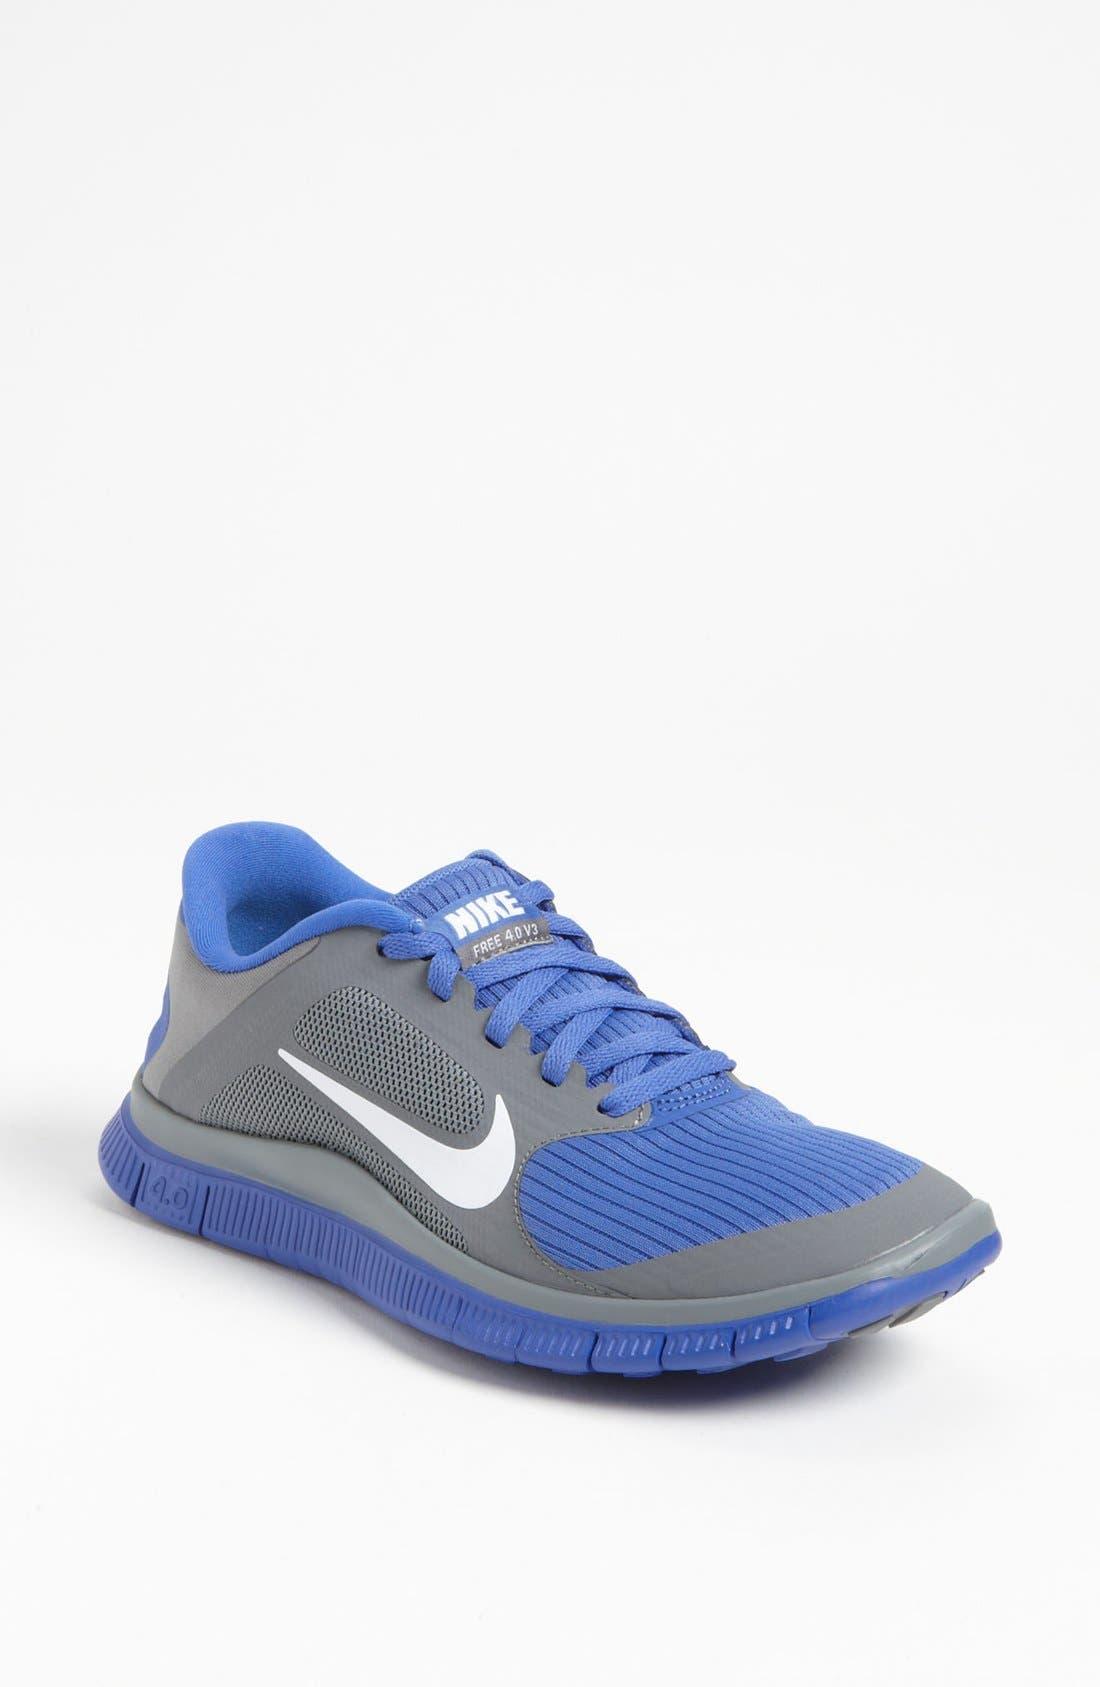 Main Image - Nike 'Free 4.0 v3' Running Shoe (Women)